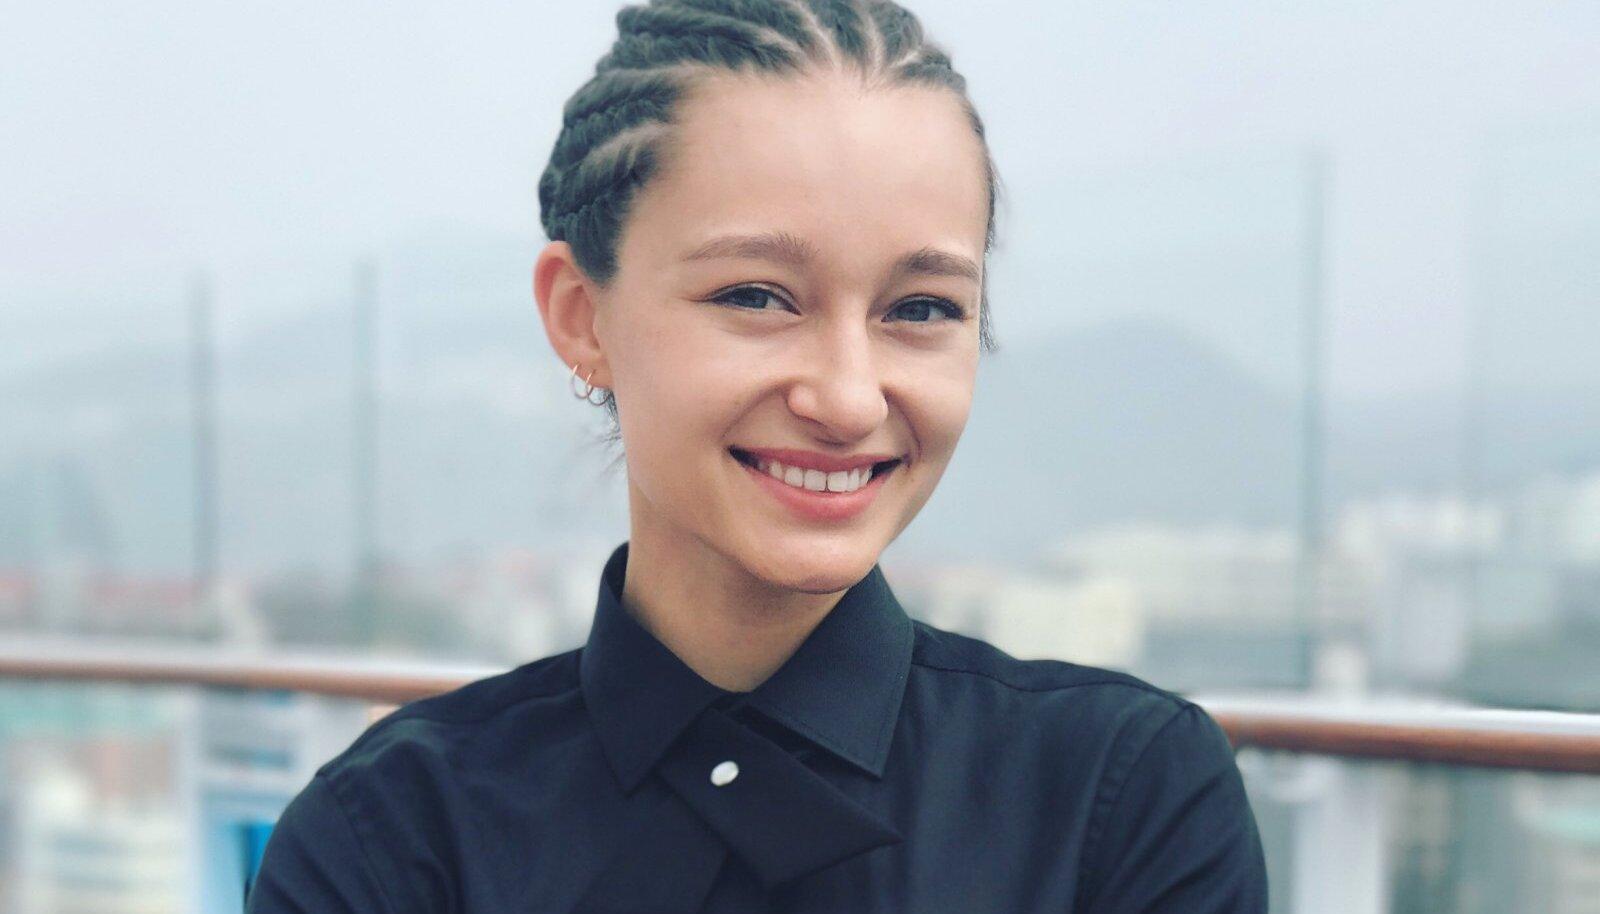 Anita Smirnova